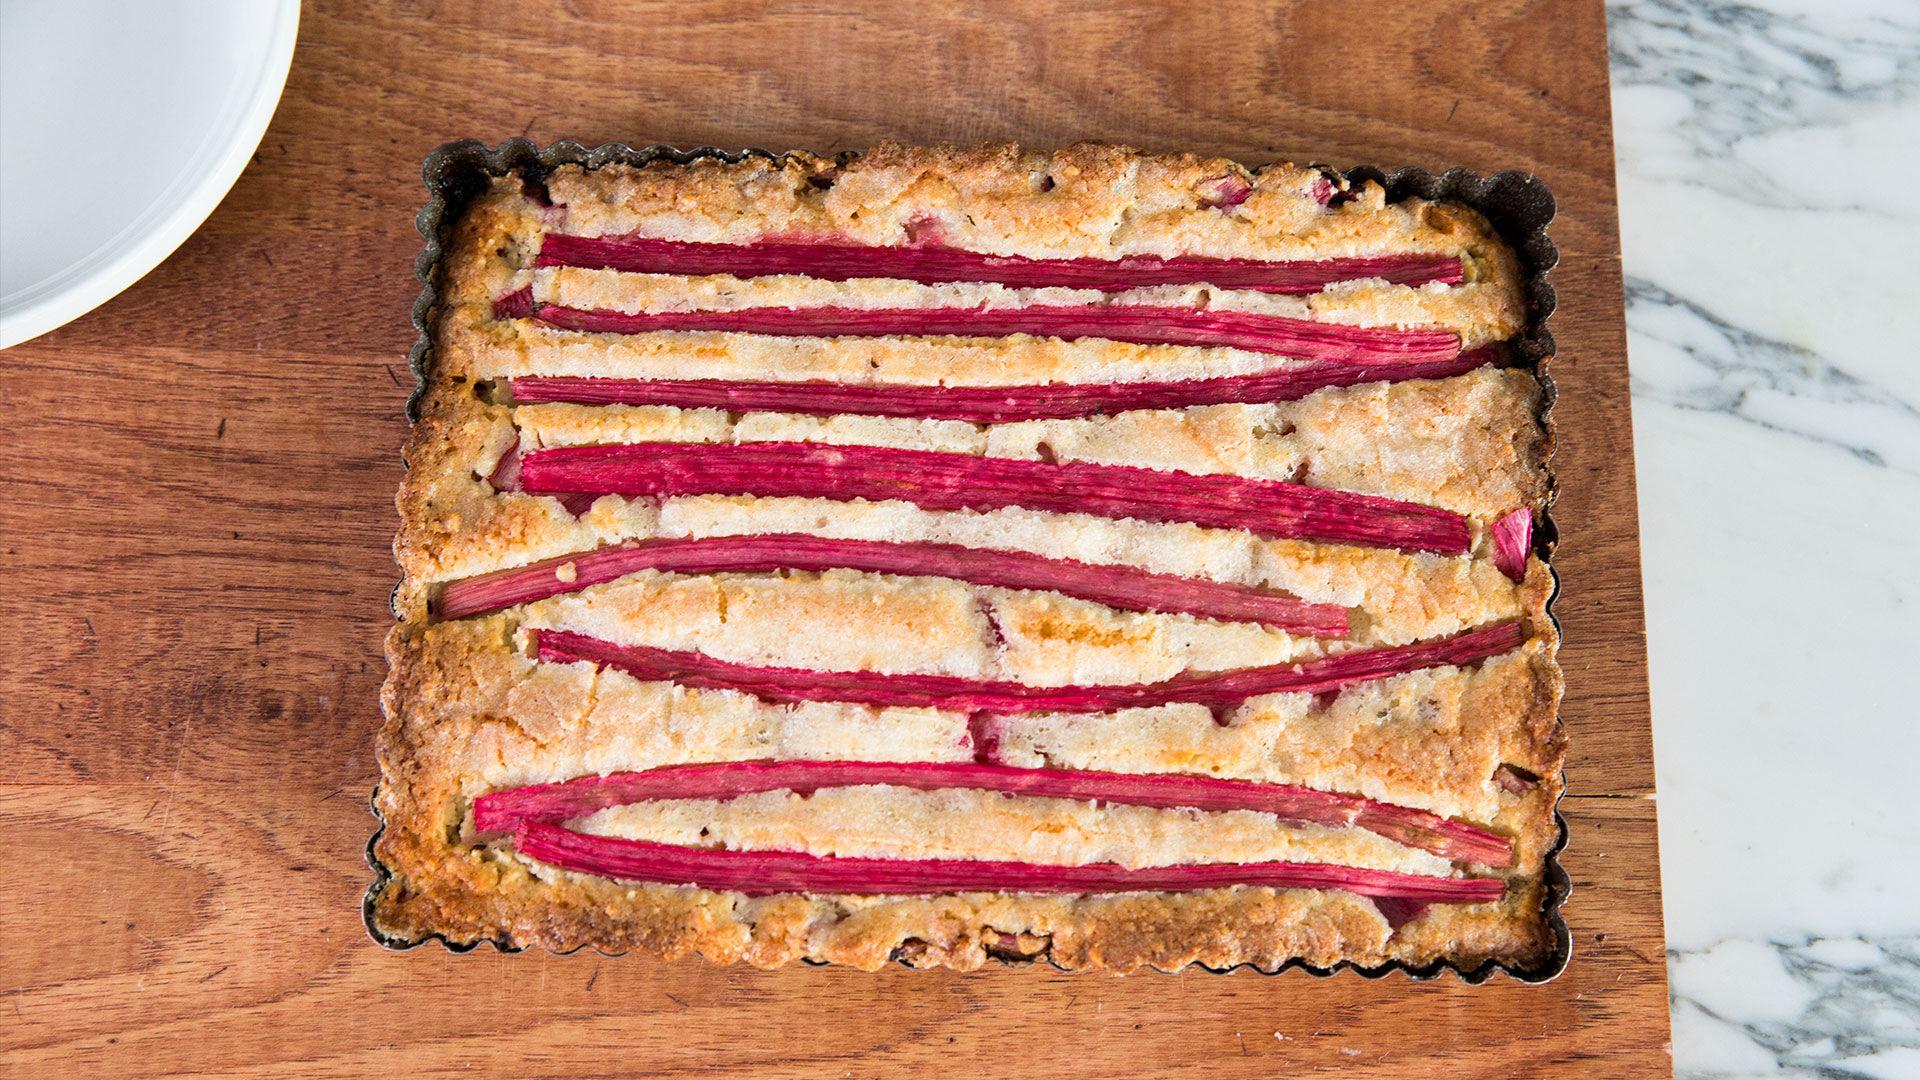 Rhubarb-Almond Cake Recipe for Easter